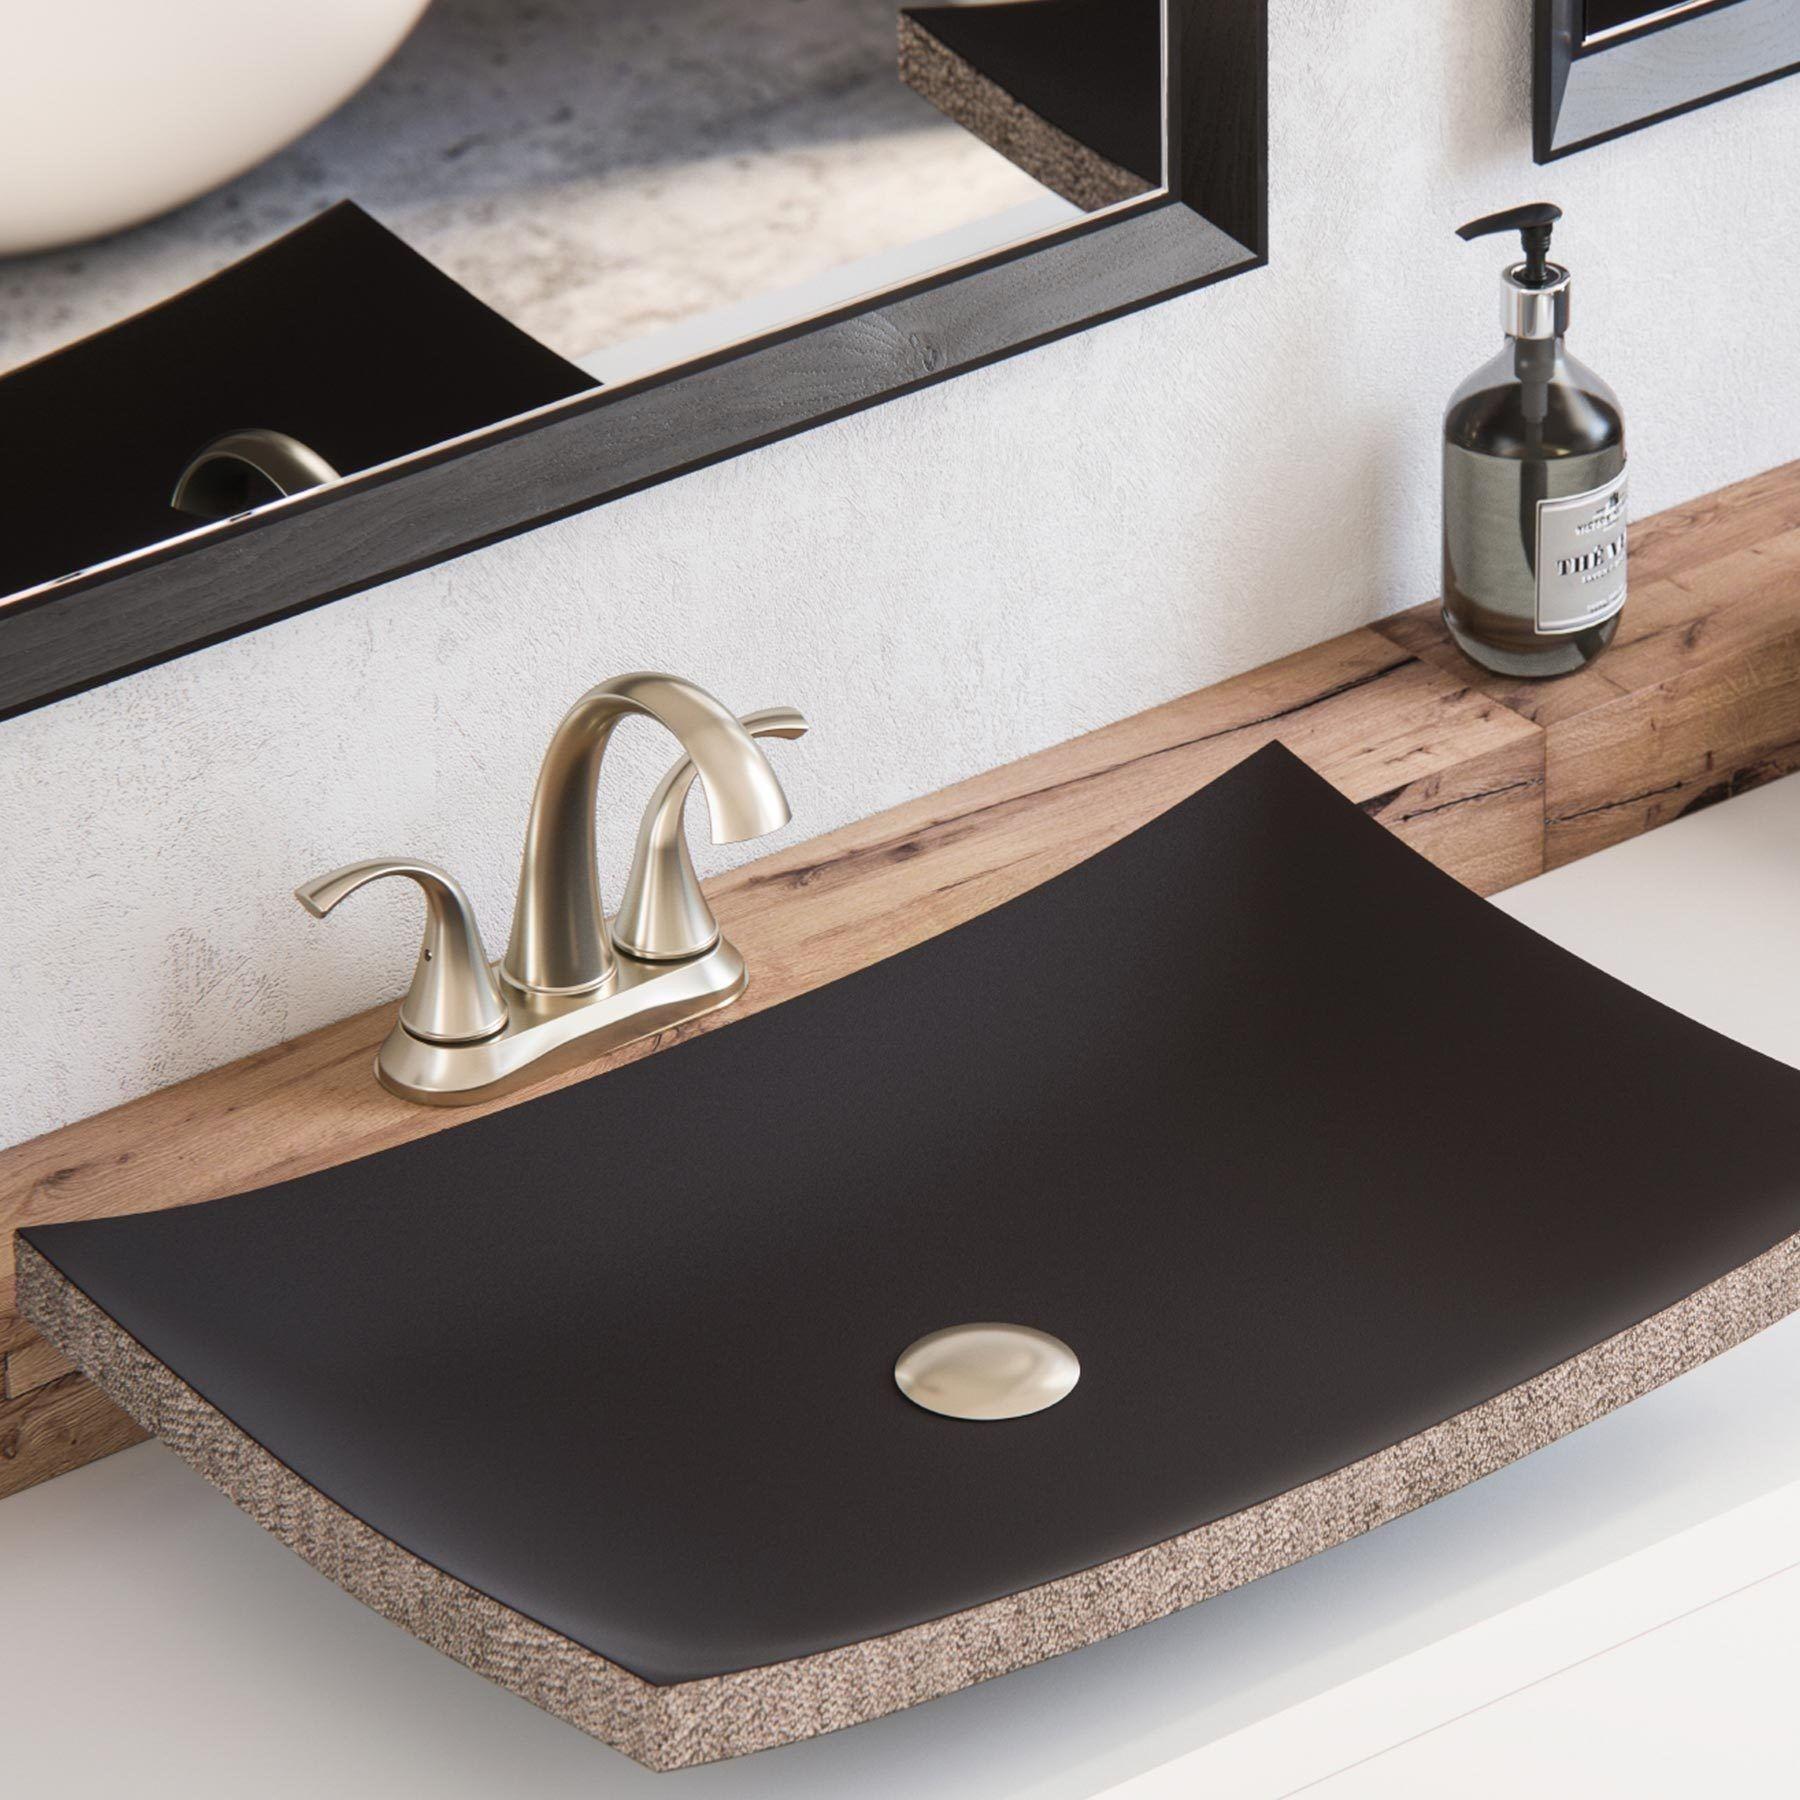 Rondo 4 Centerset Sink Faucet Sink Sink Faucets Stone Vessel Sinks